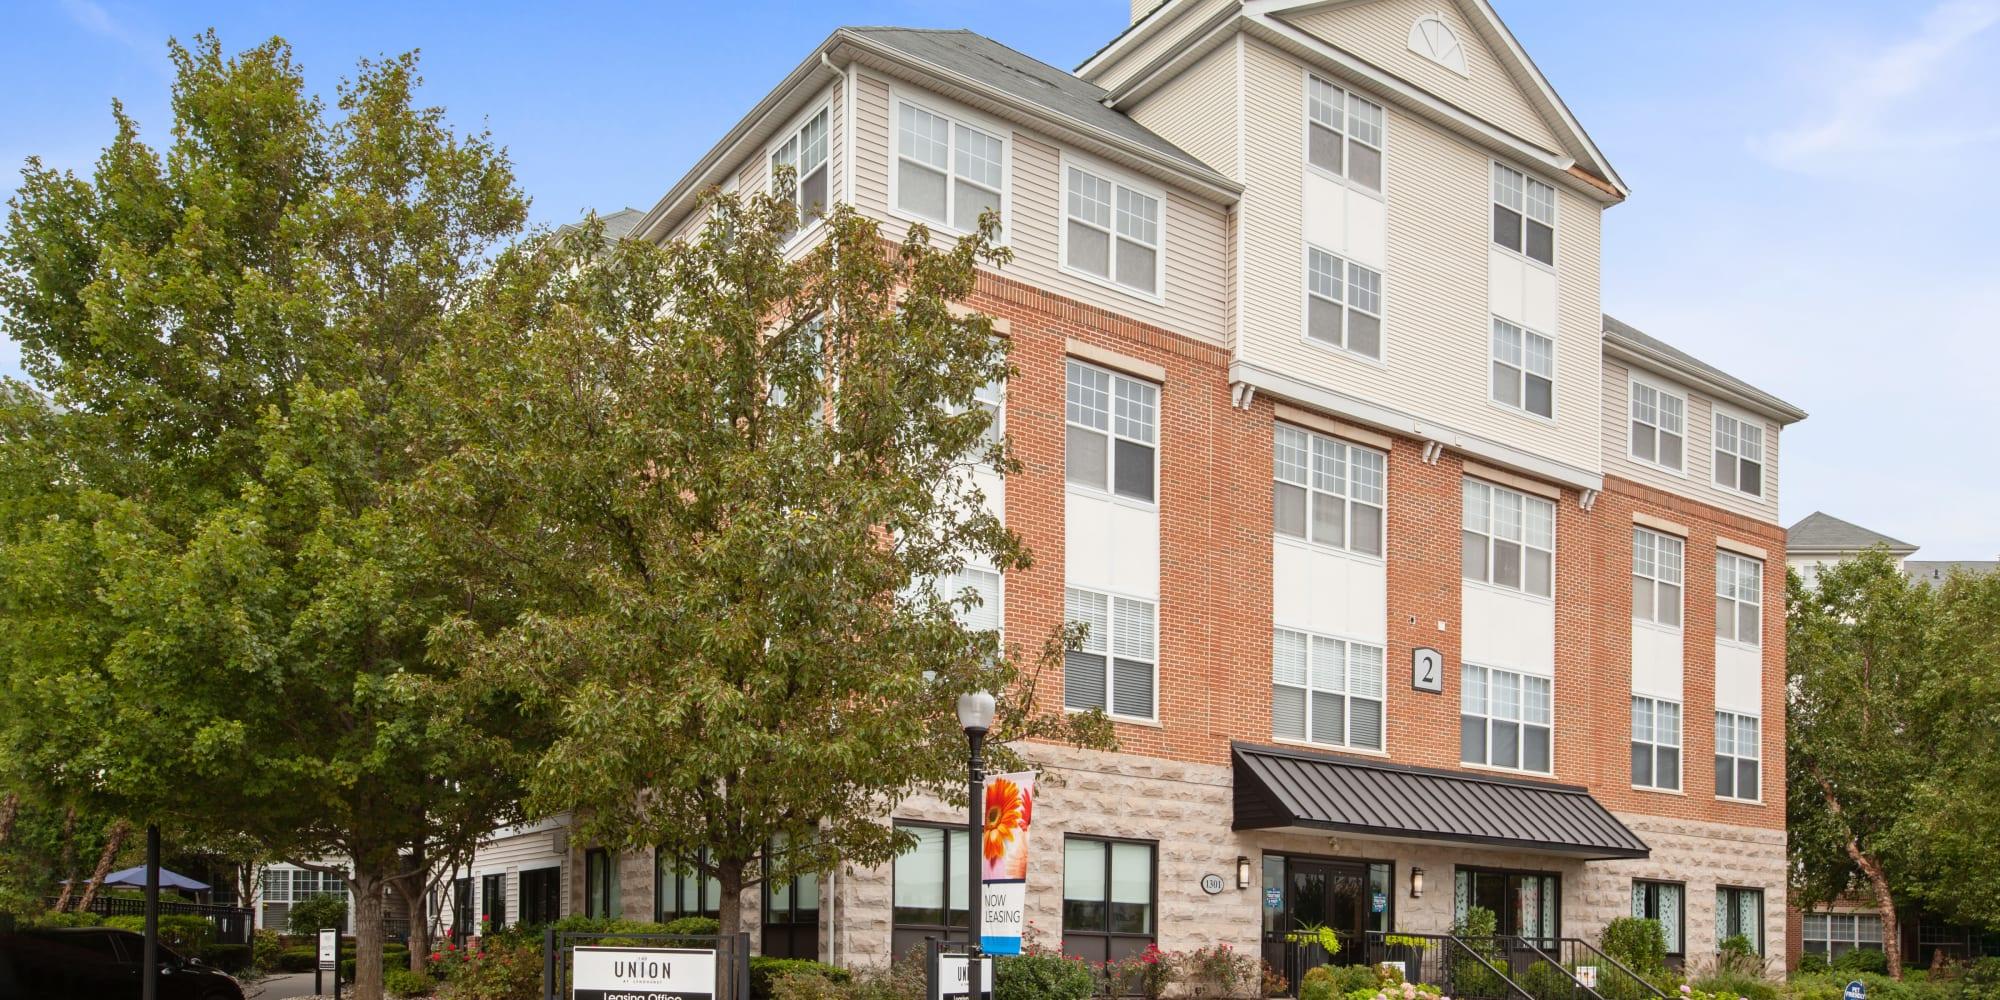 Apartments in Lyndhurst, New Jersey at Sofi Lyndhurst